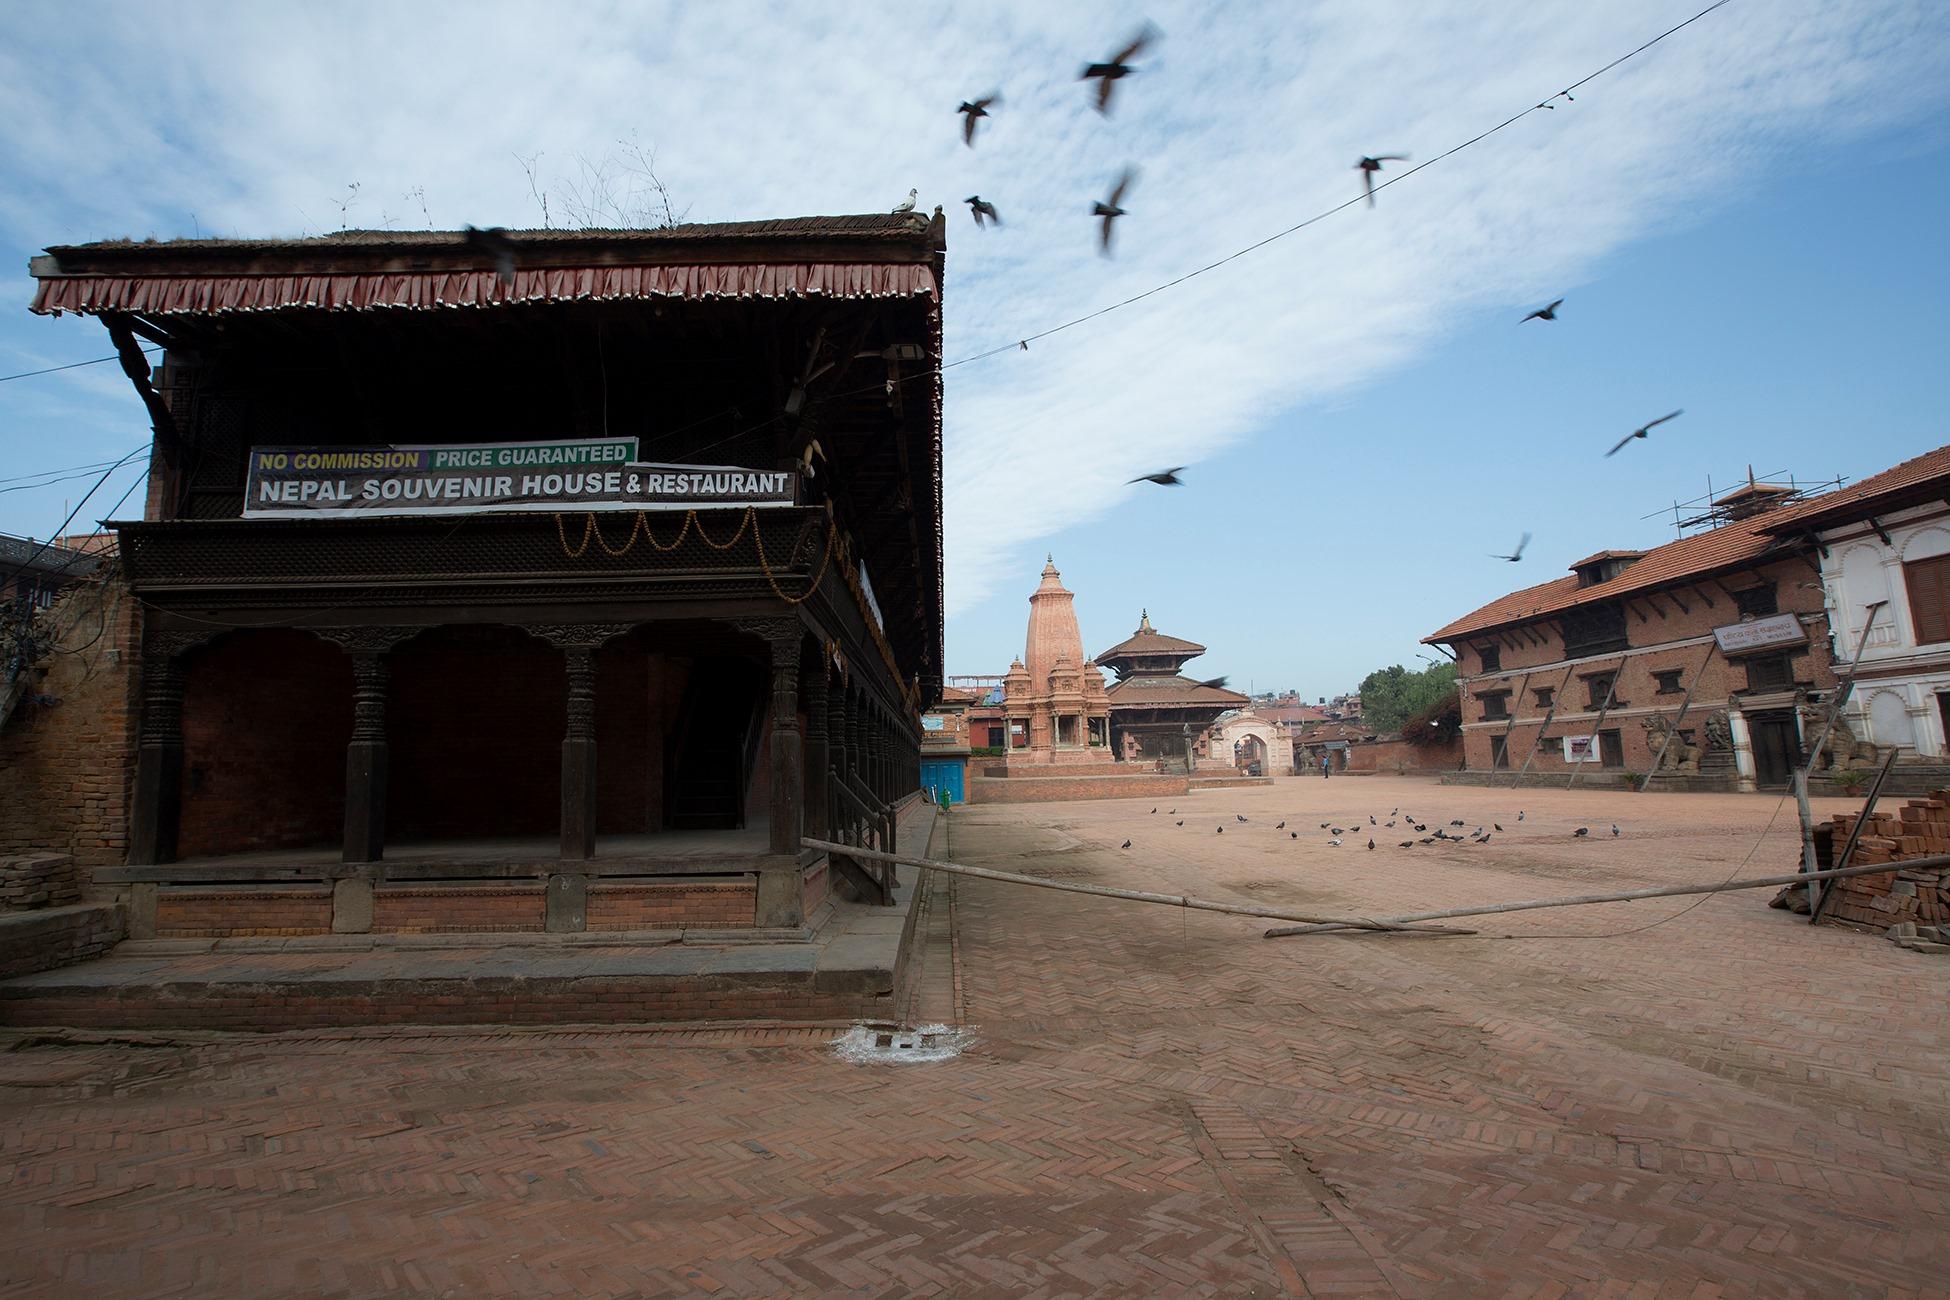 https://www.bhaktapur.com/wp-content/uploads/2020/06/durbar-square-Shree-Bhushan-Sujakhu.jpg